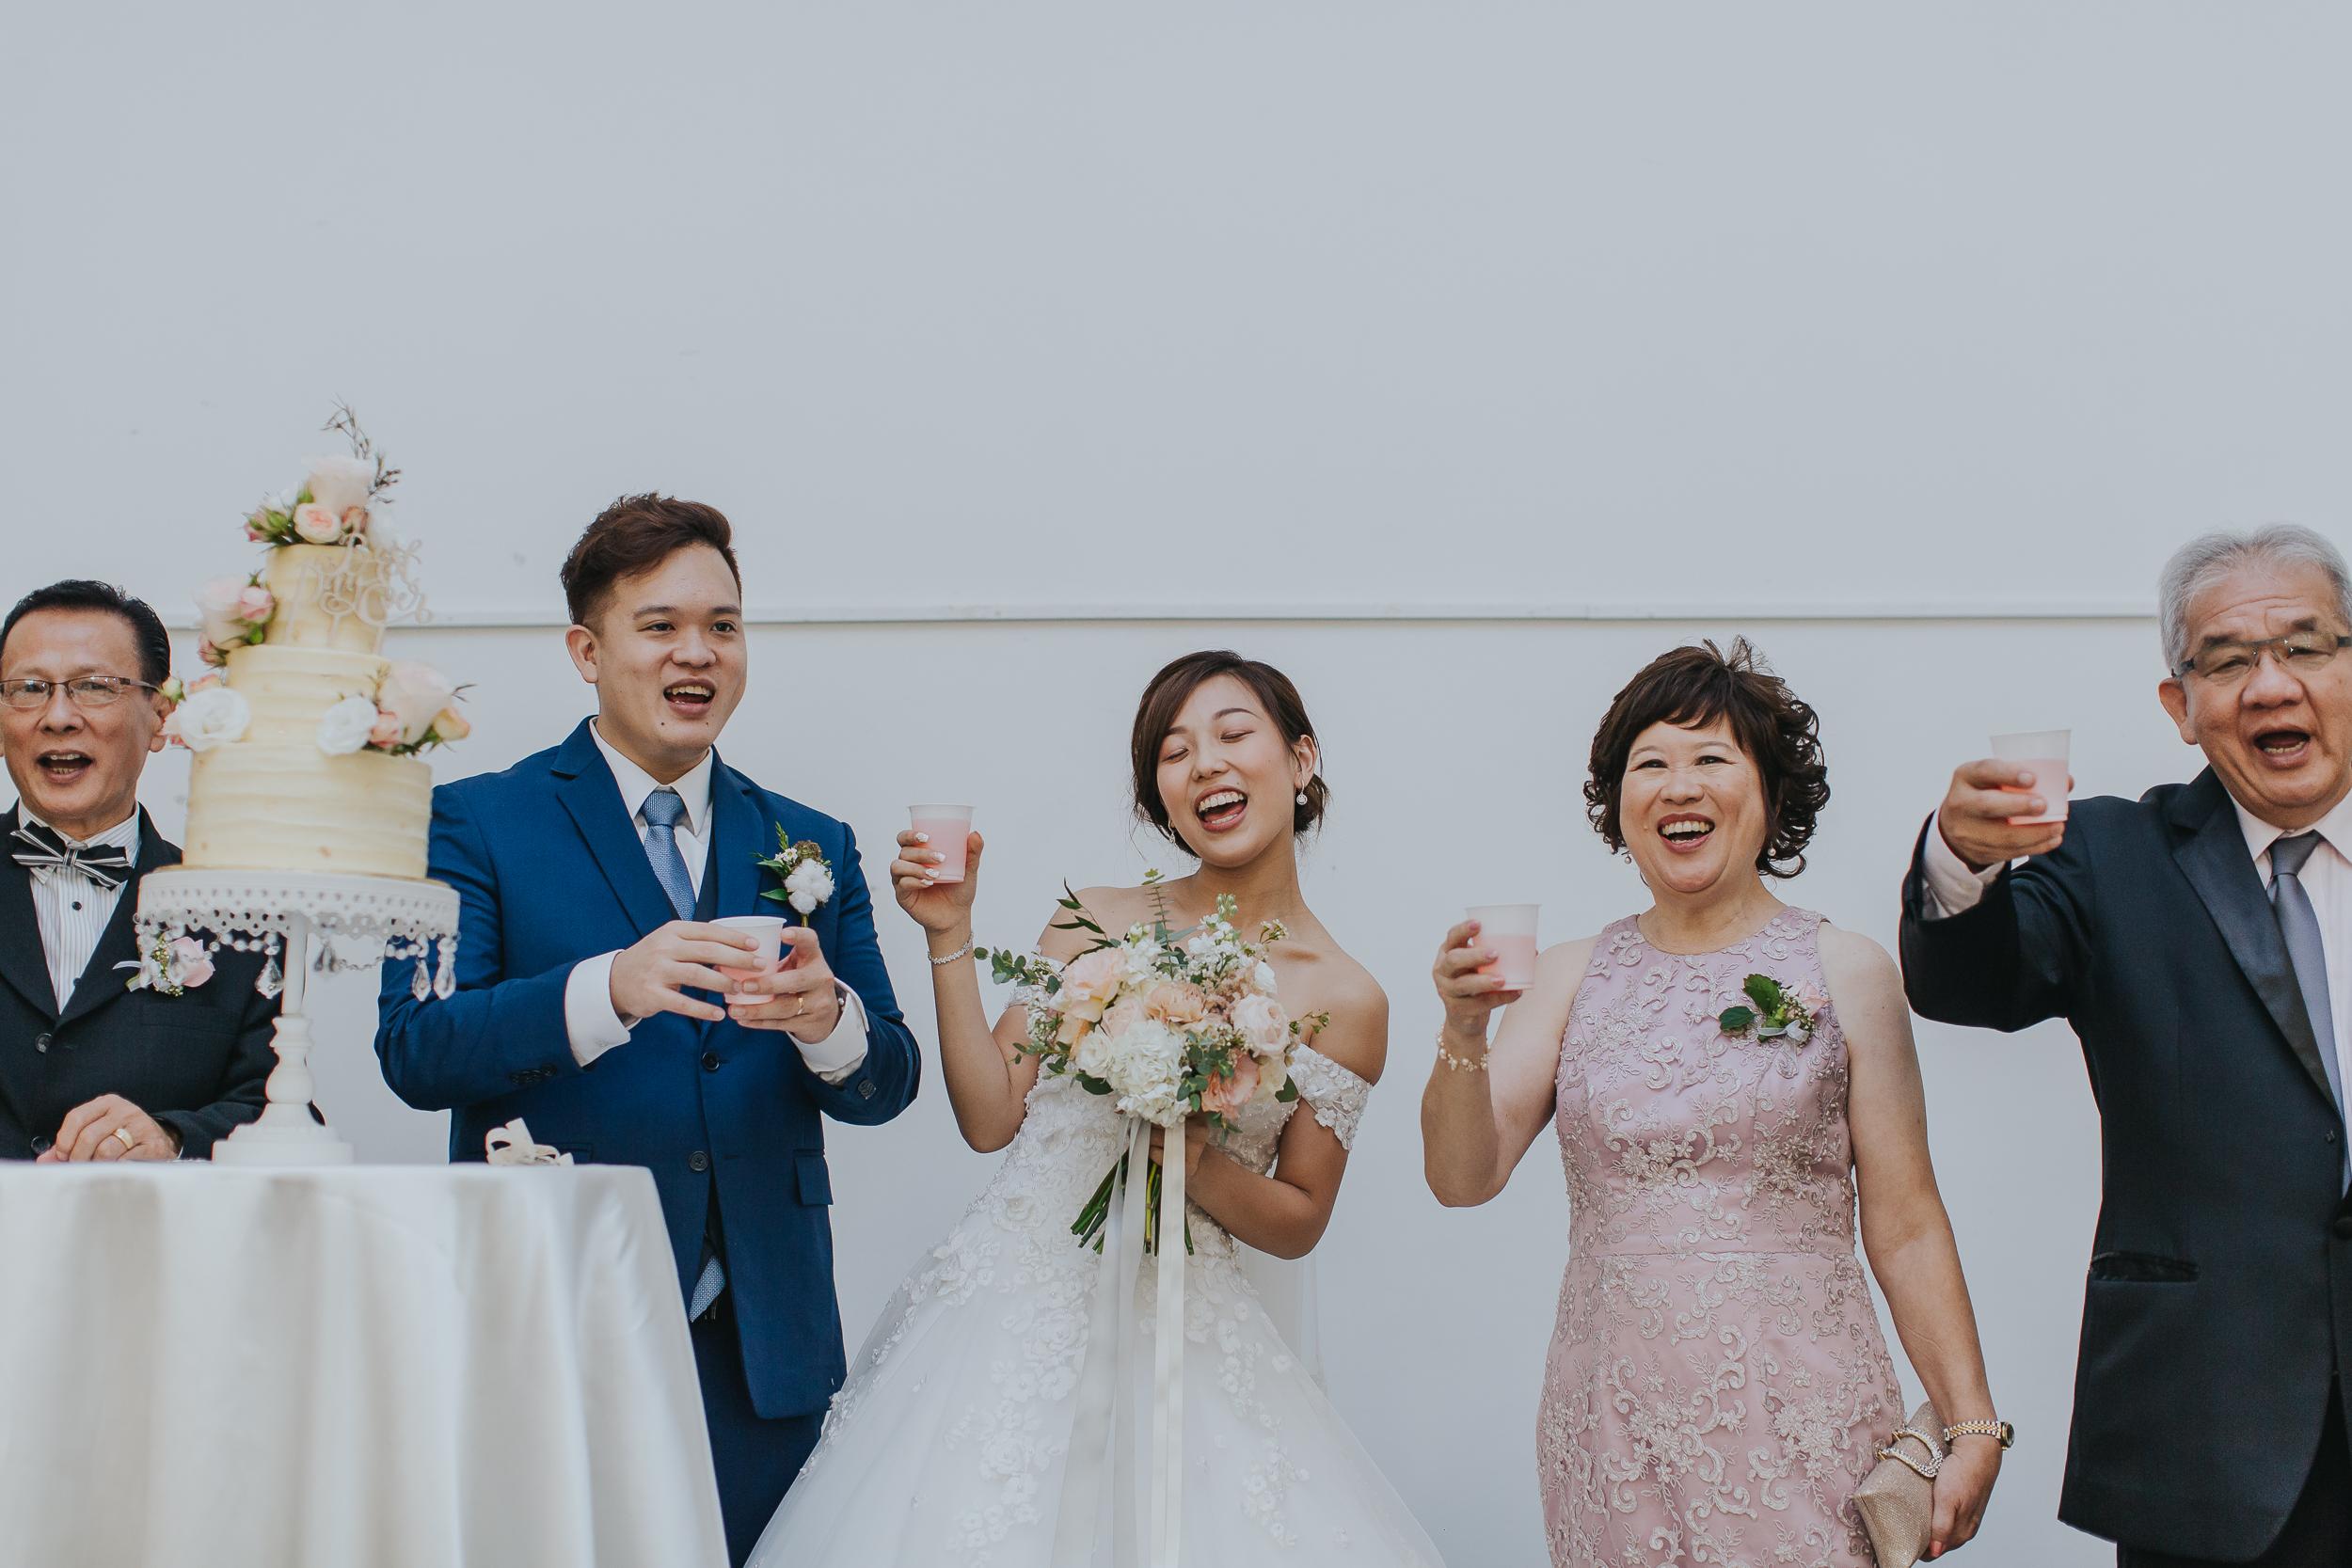 Singapore+Actual+Day+Wedding+Photographer+Grand+Mercure+Oliver+Estelle-0068.jpg